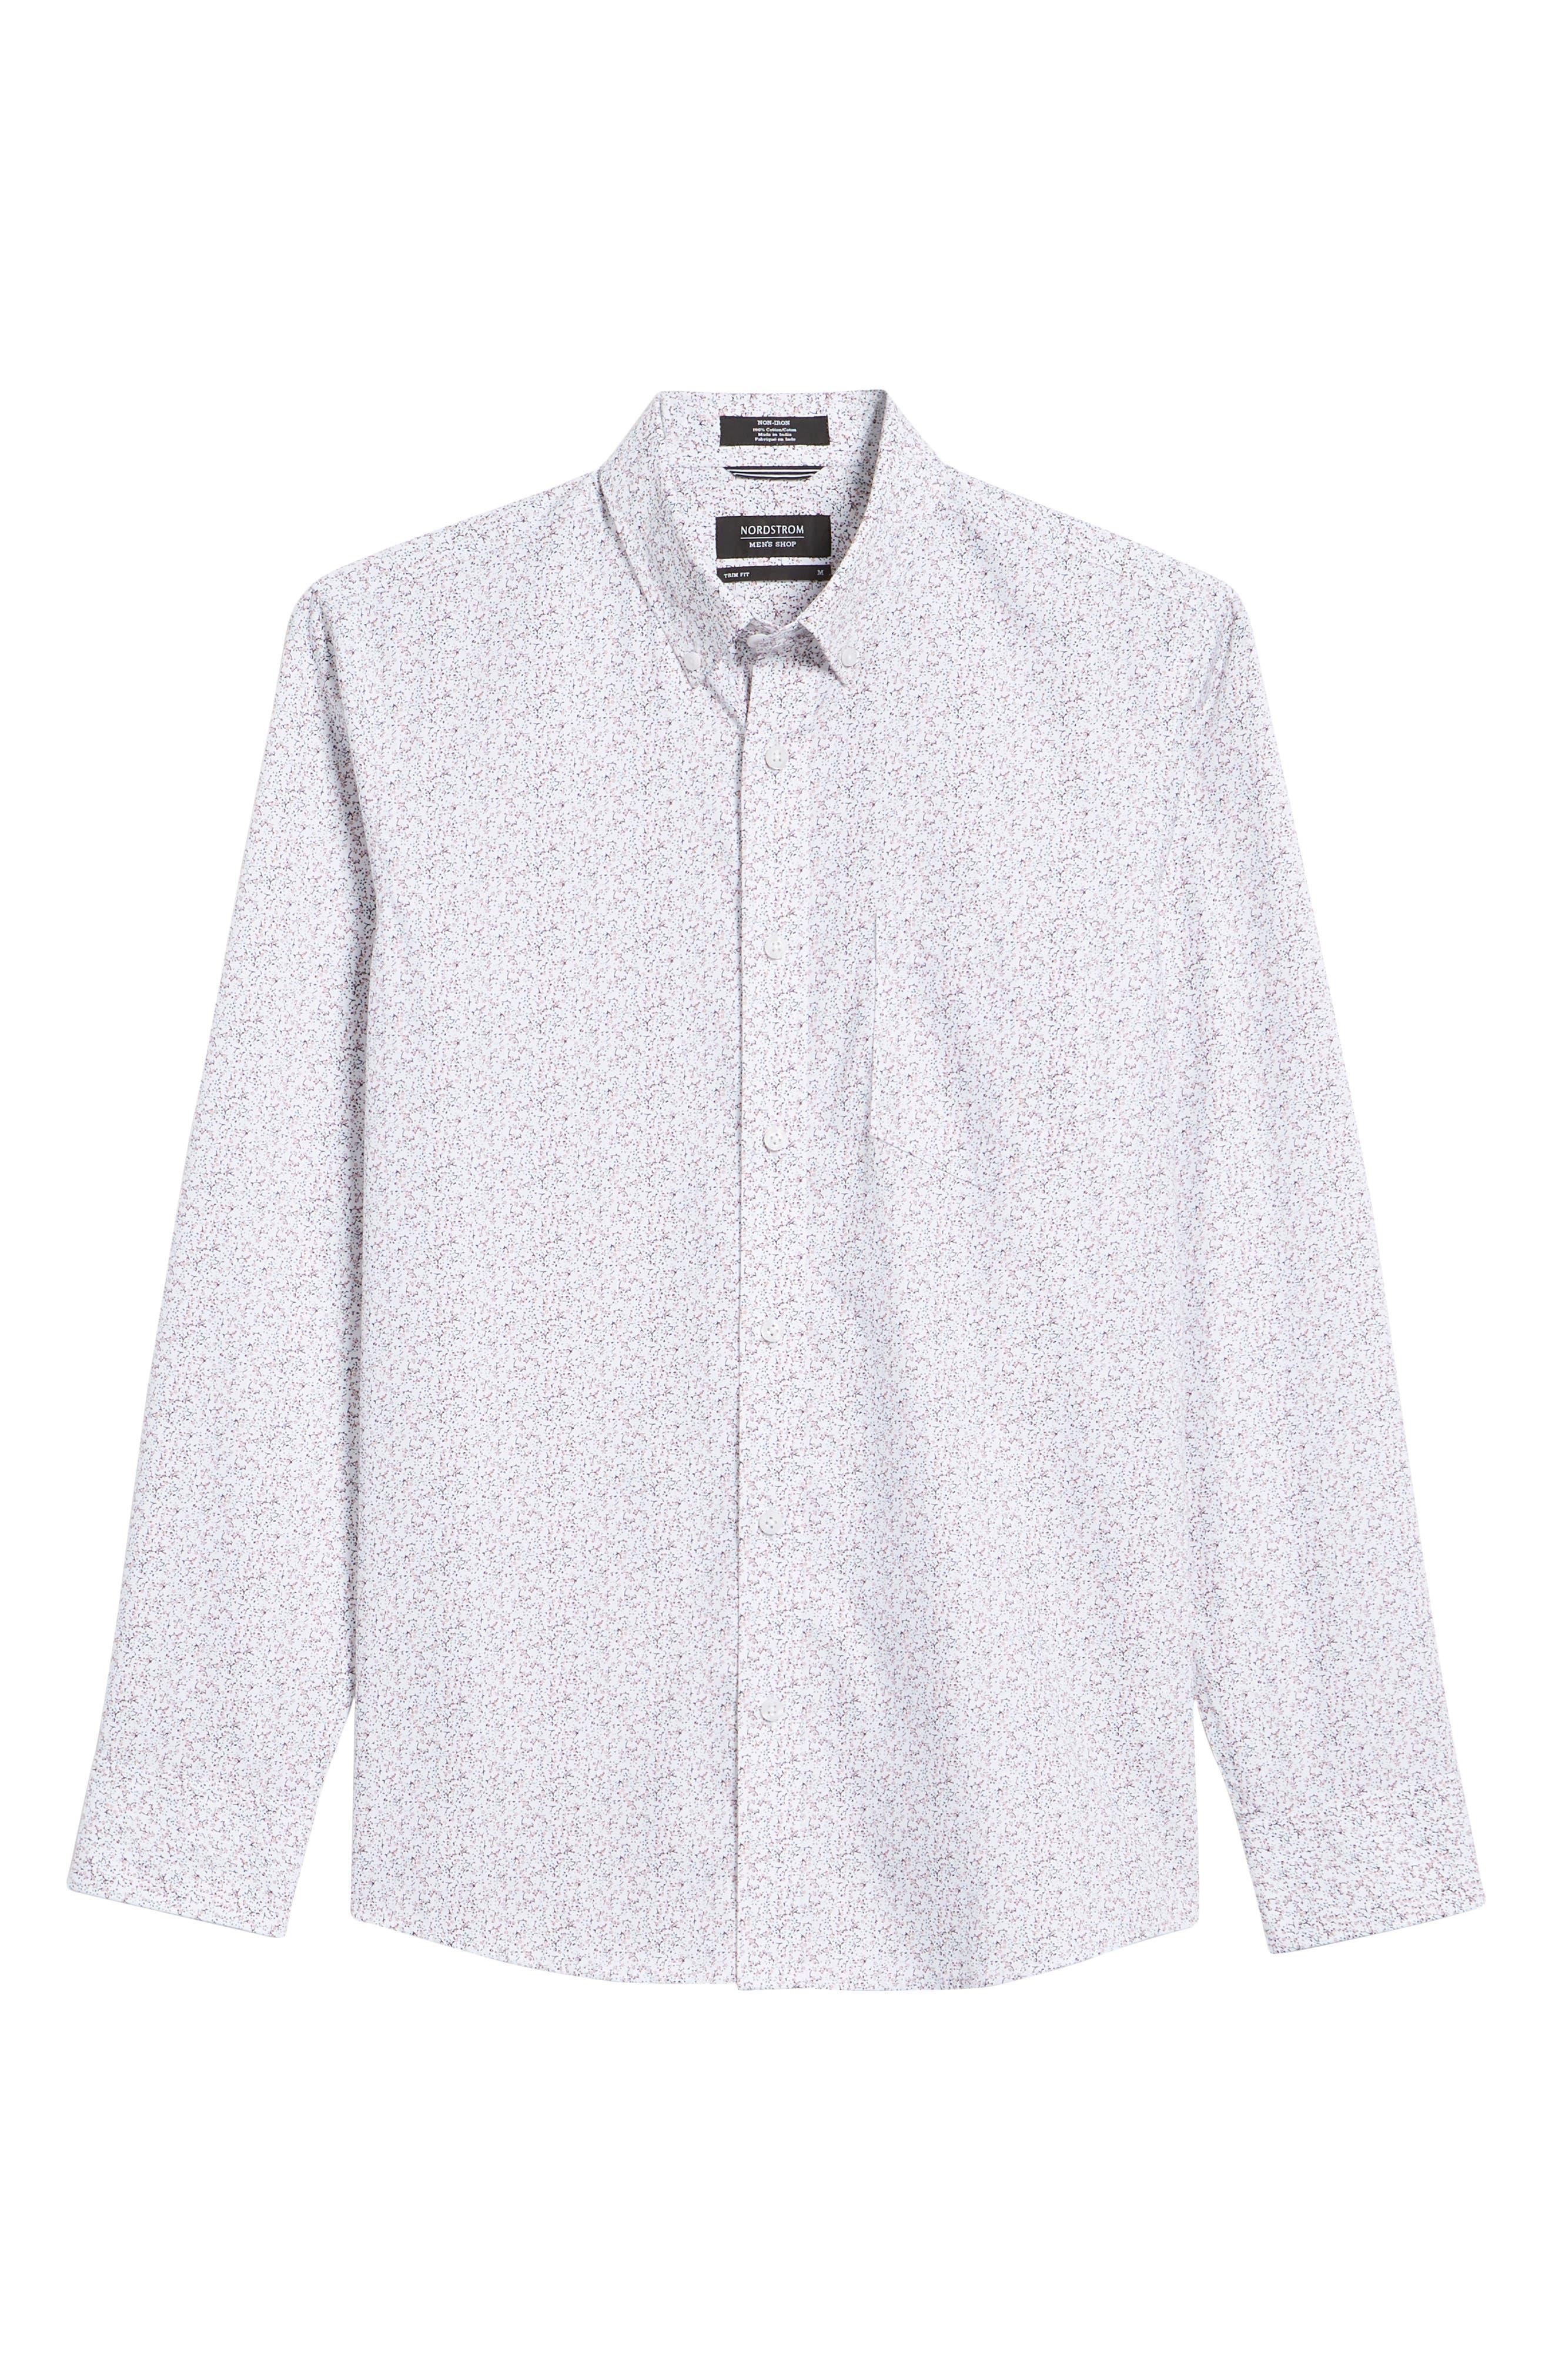 Trim Fit Print Sport Shirt,                             Alternate thumbnail 6, color,                             WHITE NAVY SPRING FLORAL